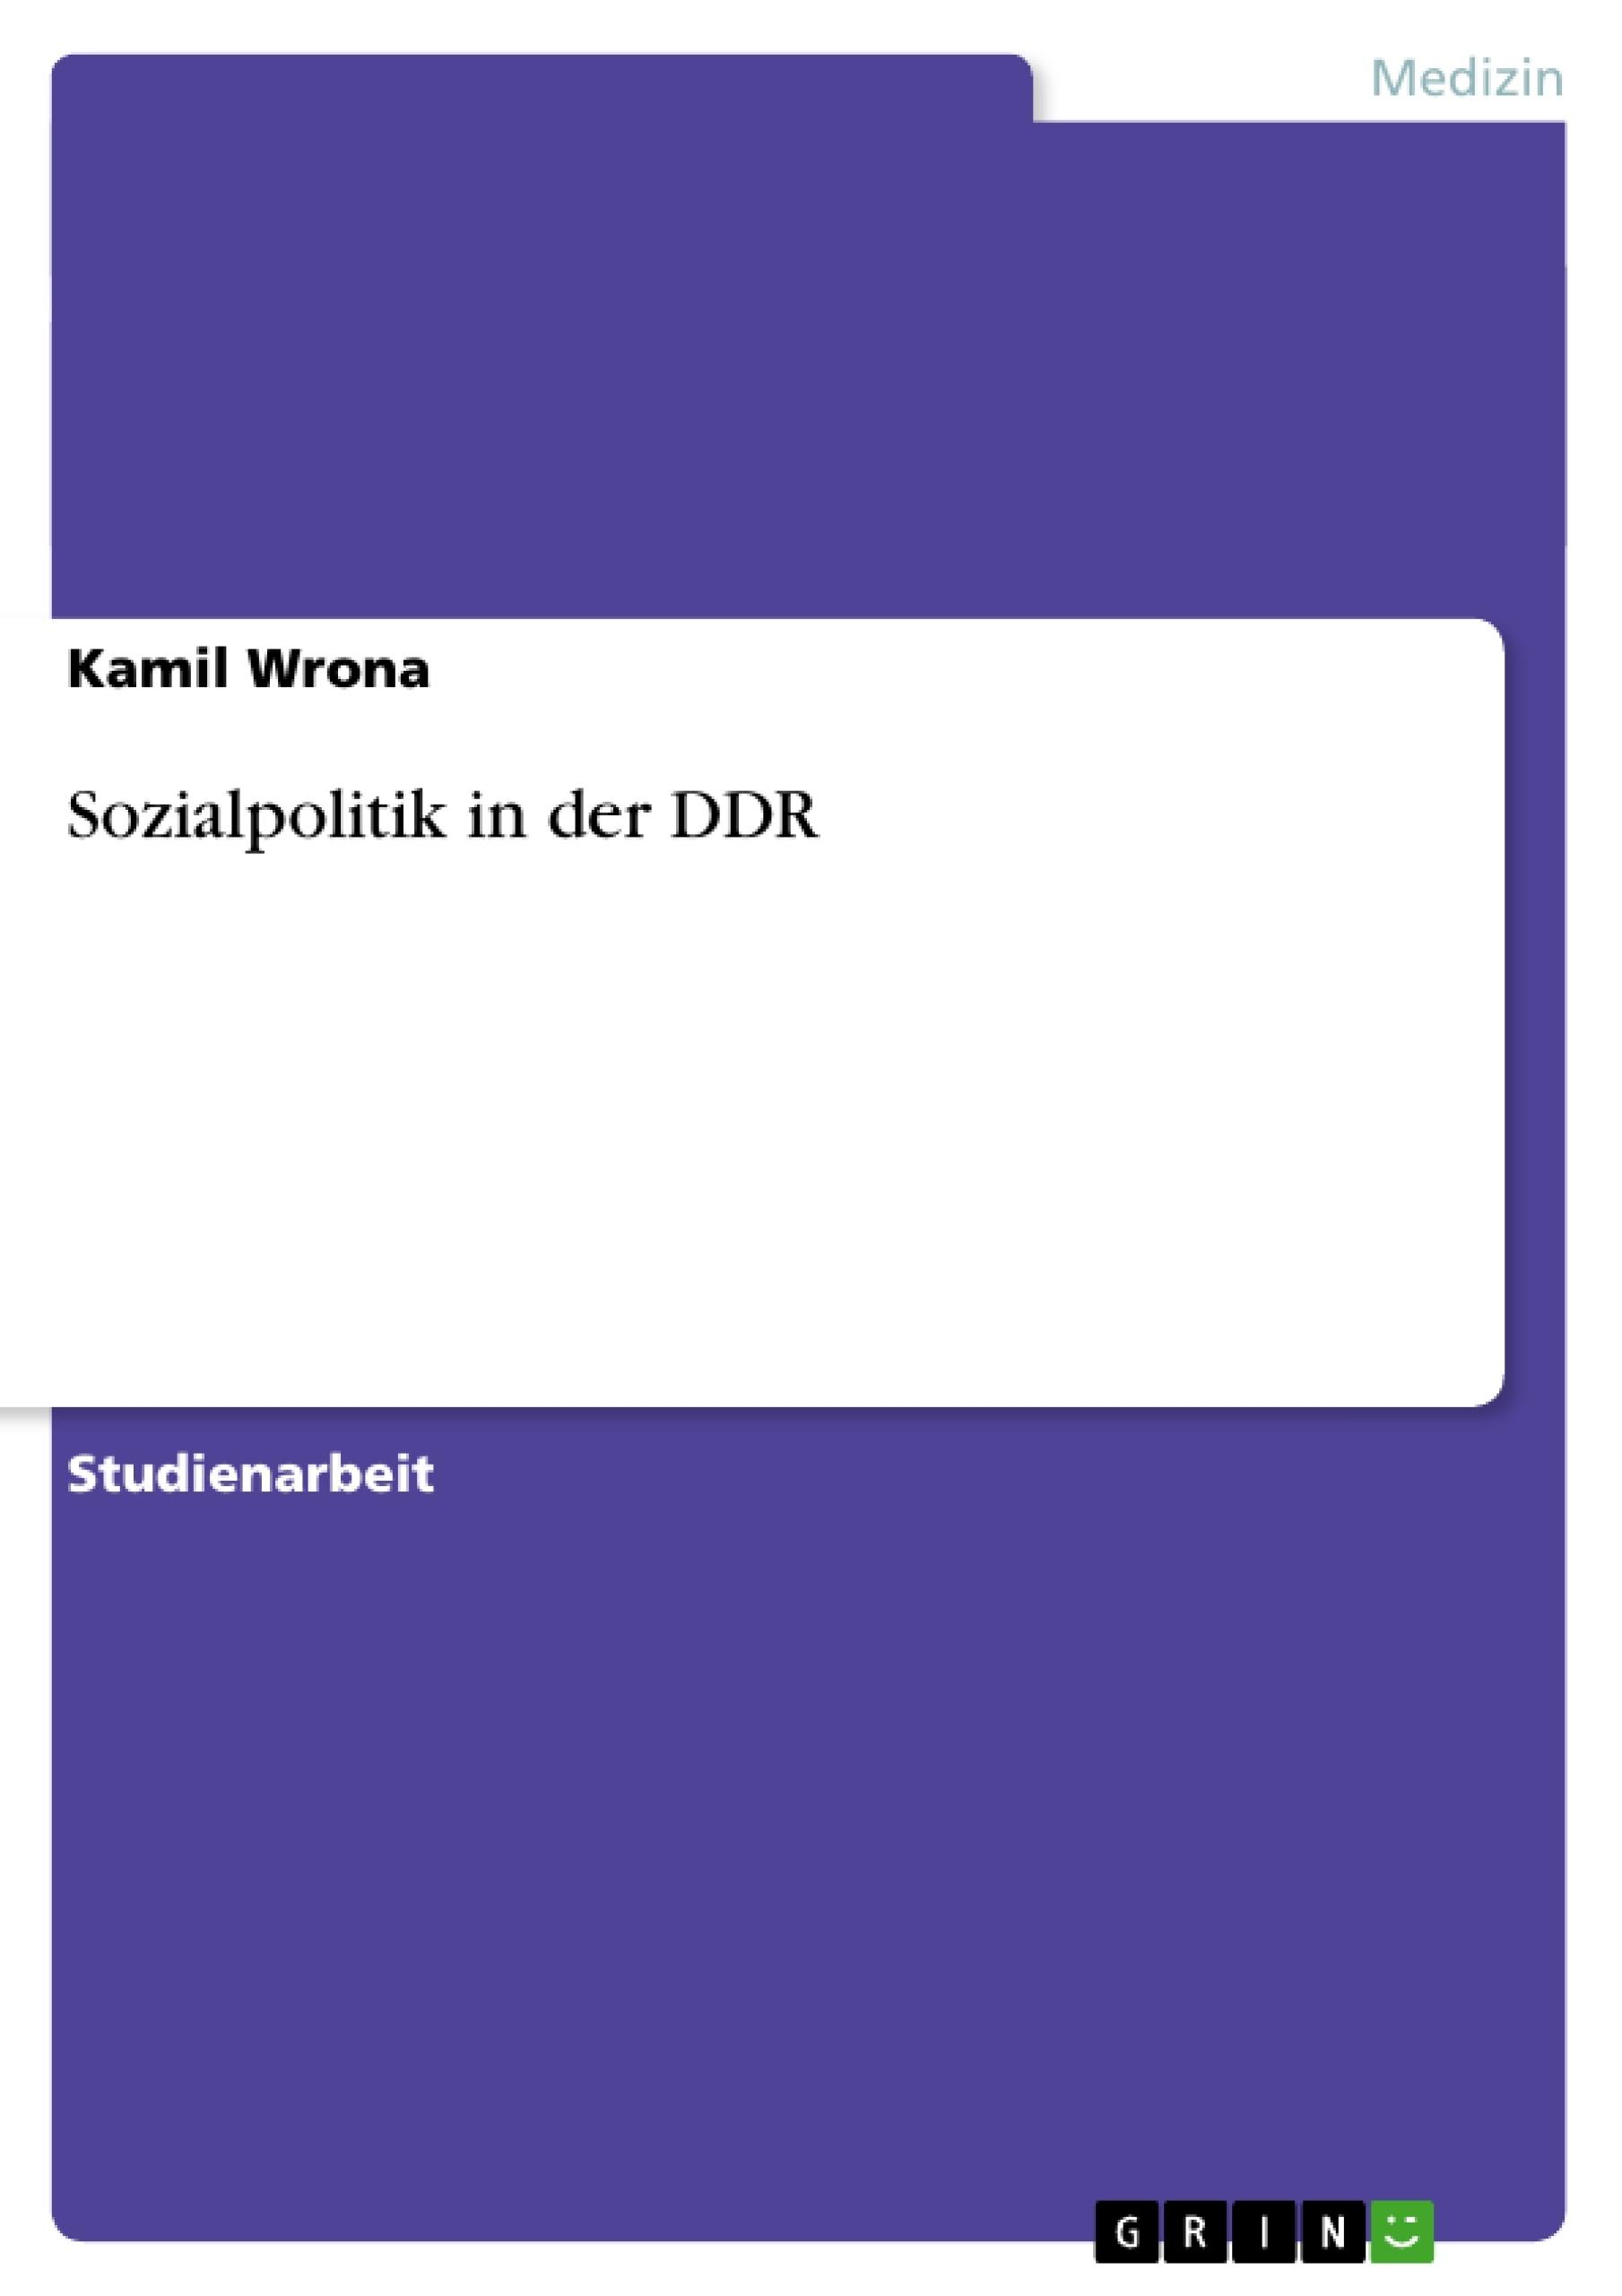 Titel: Sozialpolitik in der DDR